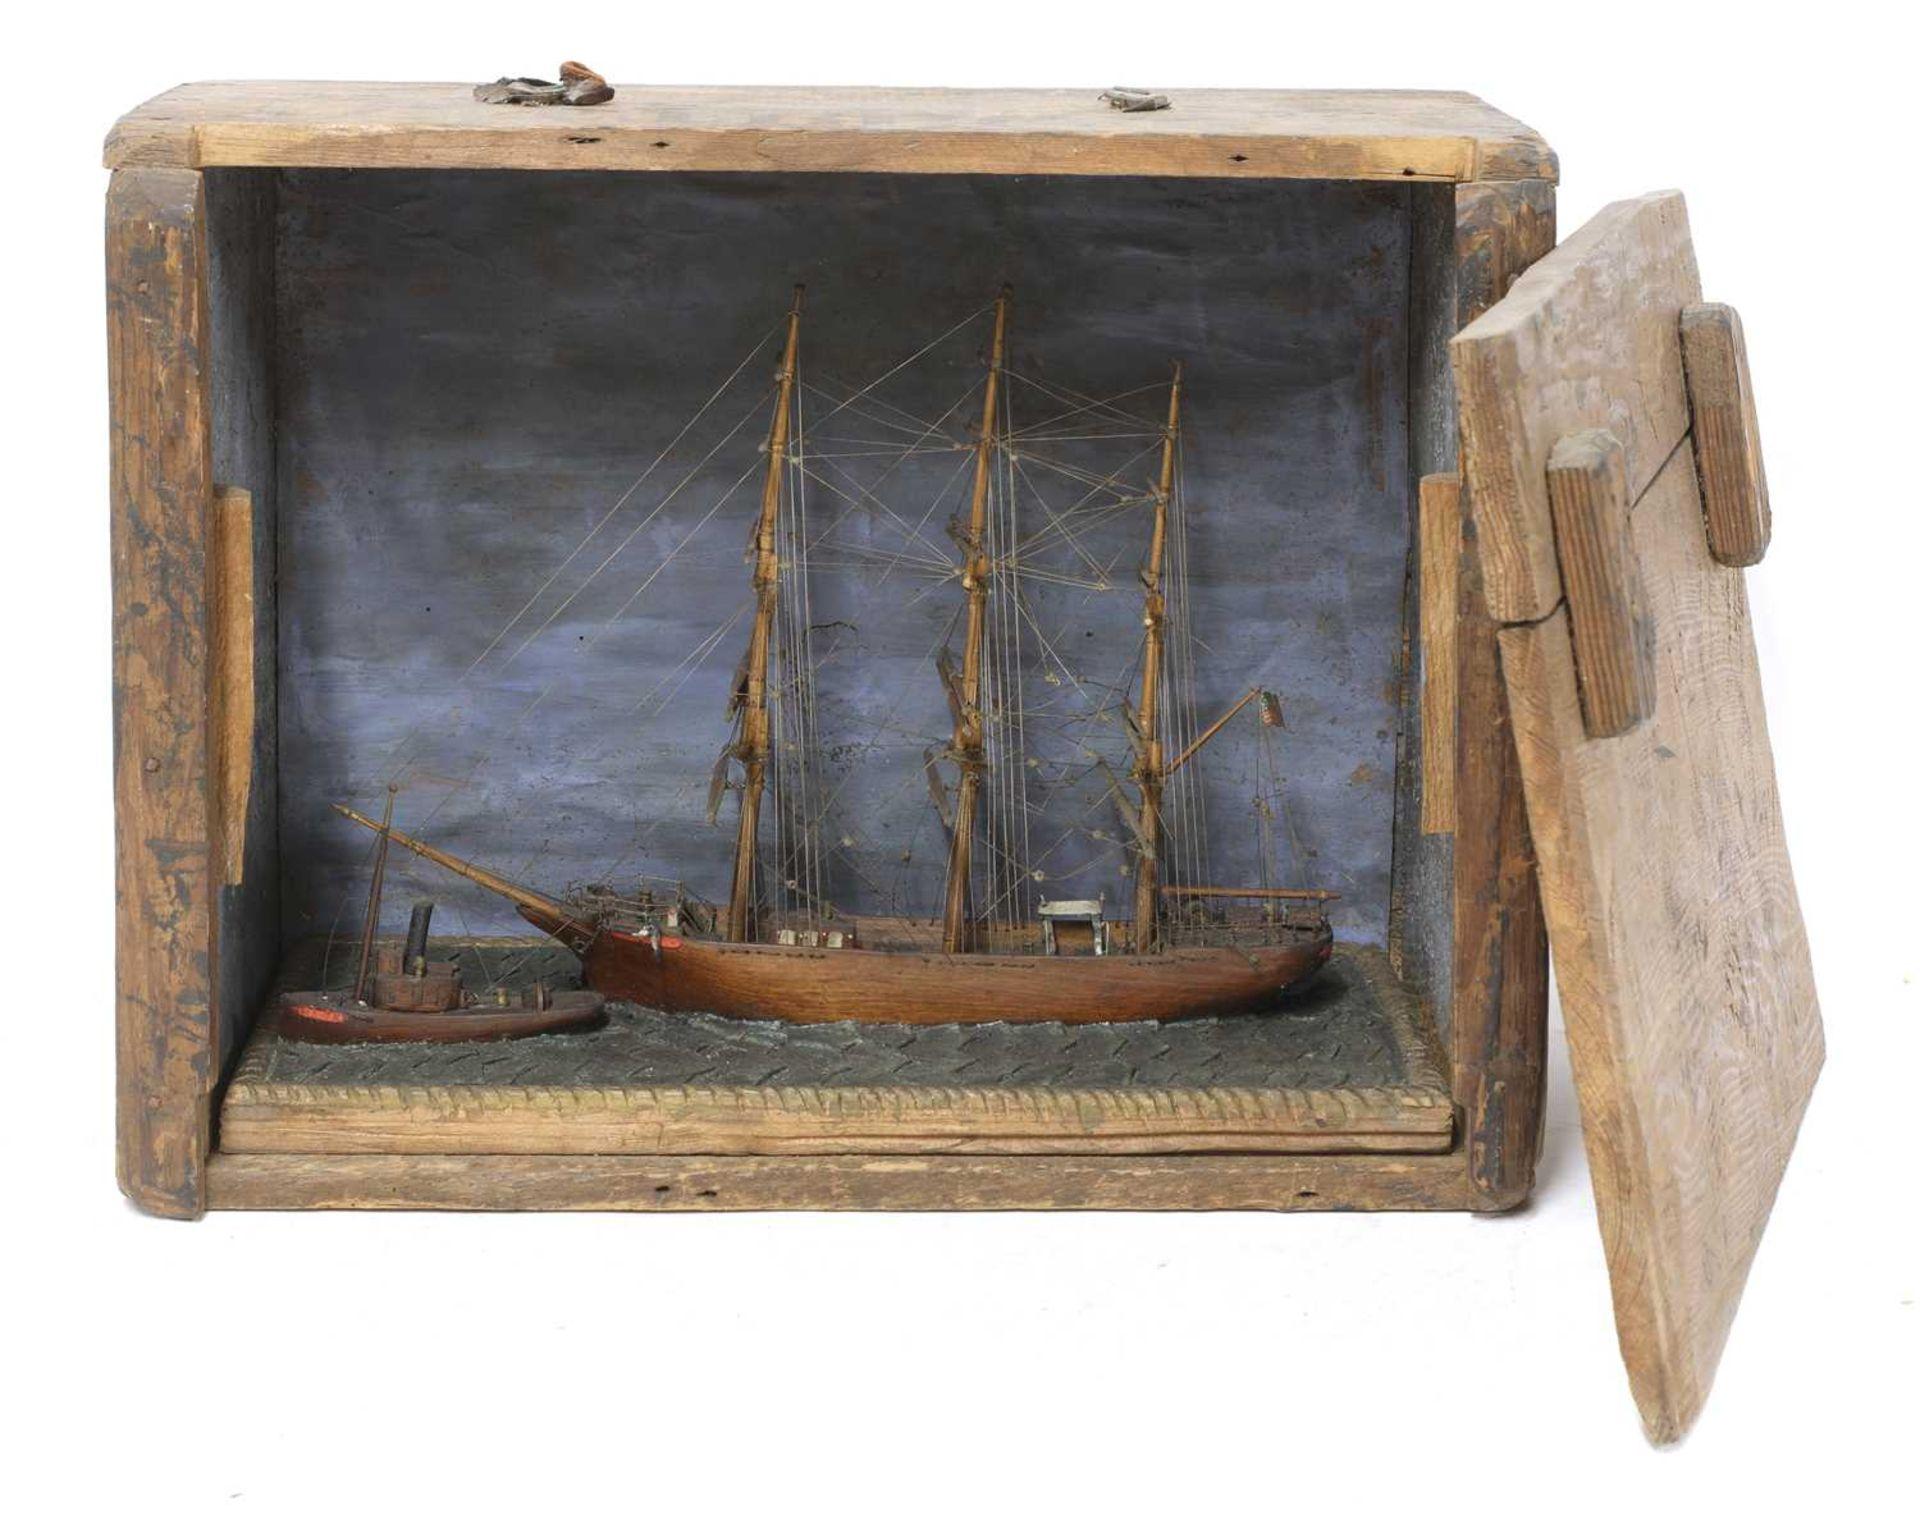 A North American scratch built, folk art, ship model,